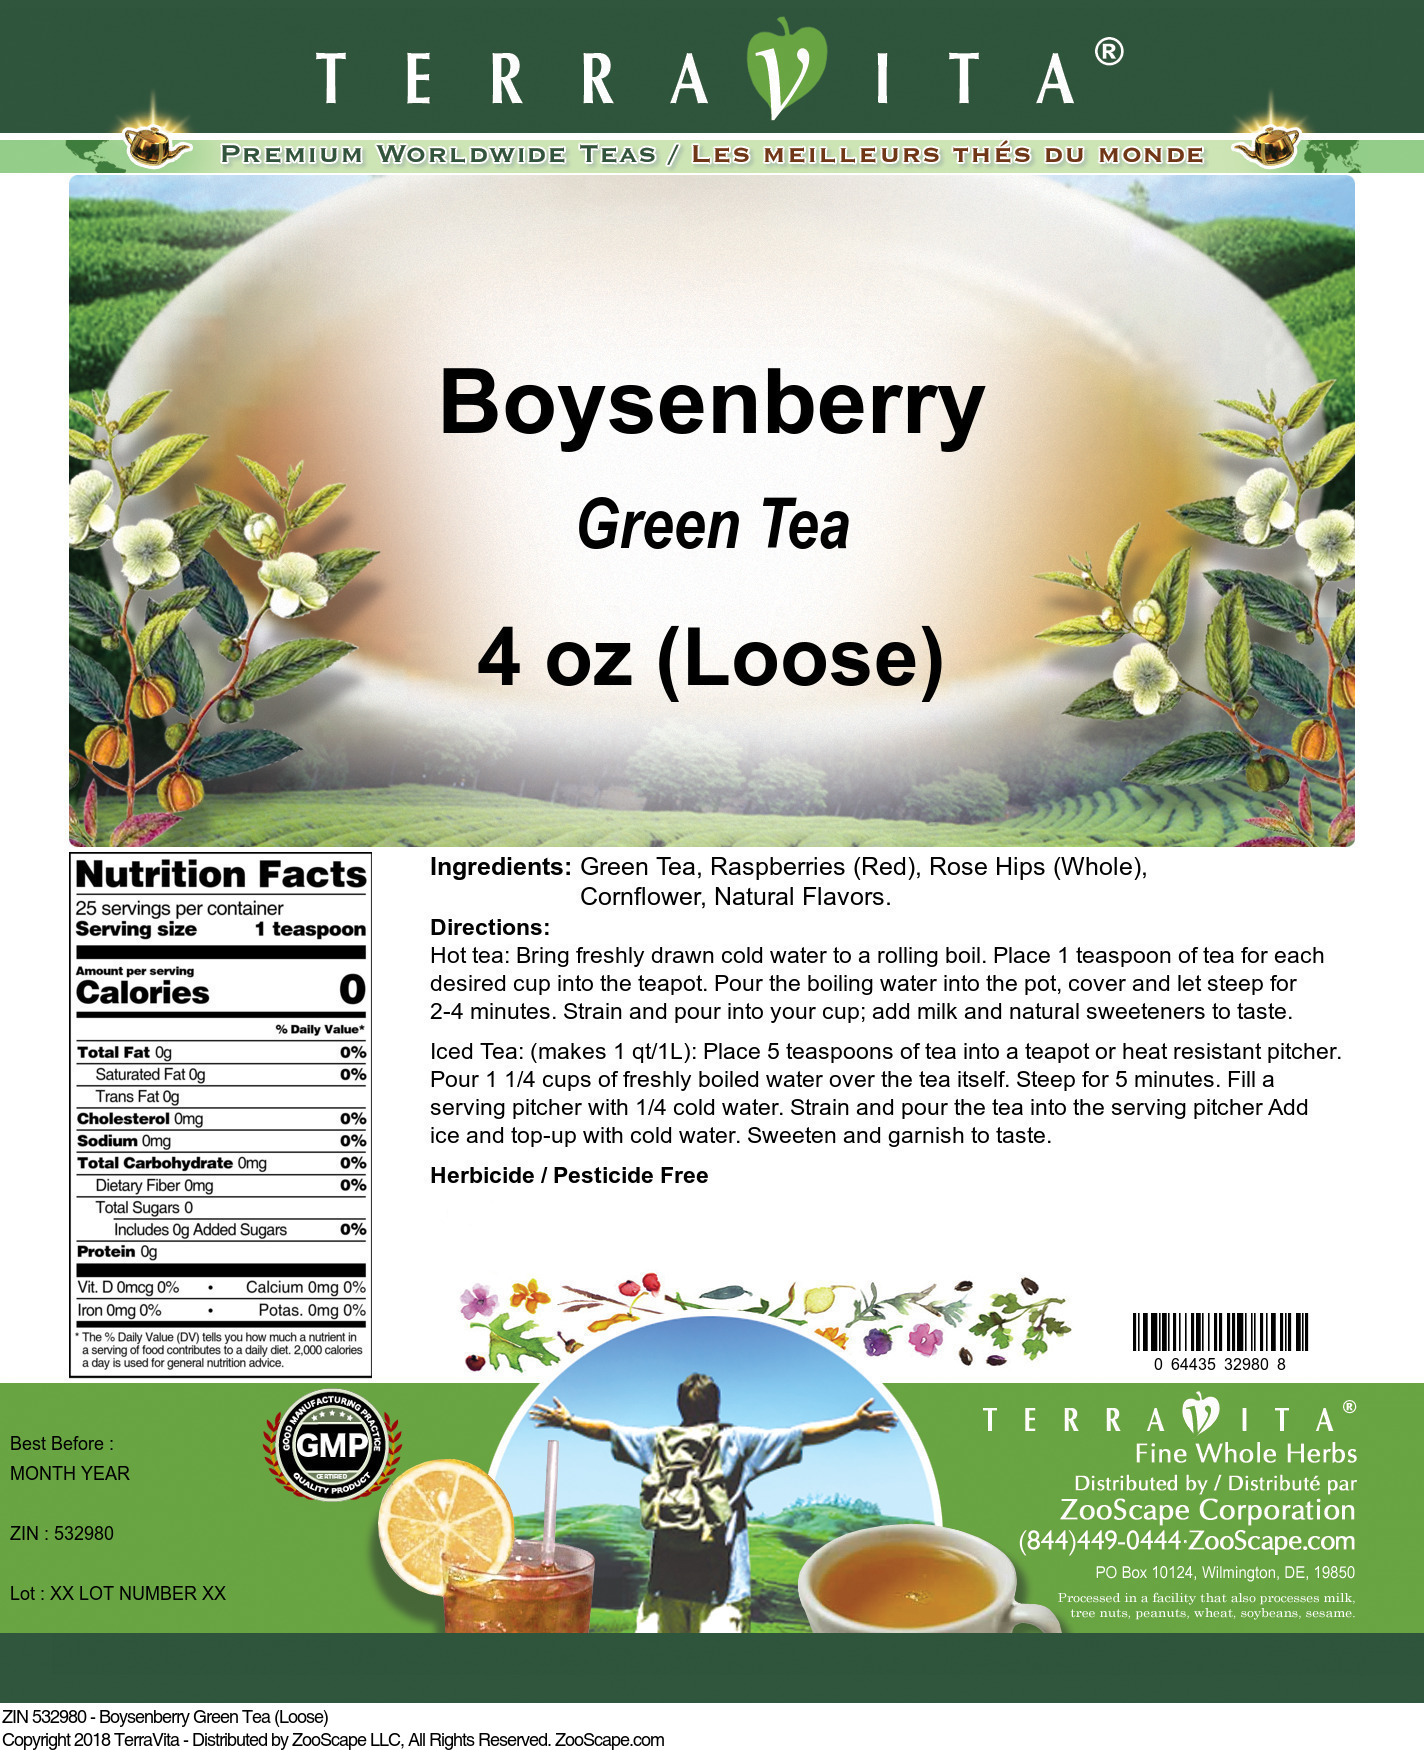 Boysenberry Green Tea (Loose)